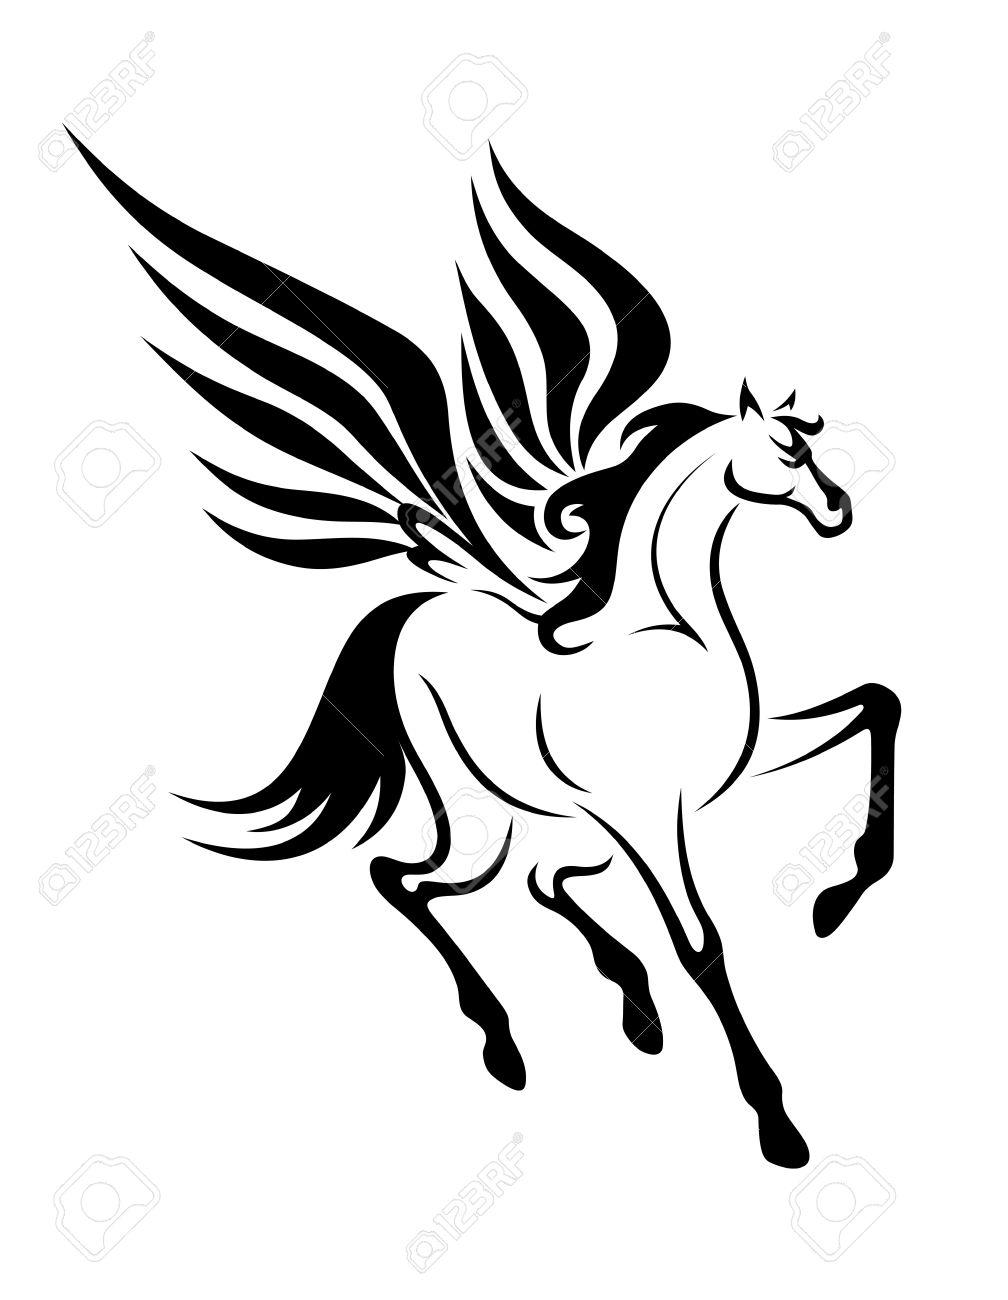 Black pegasus clipart graphic free download Pegasus Clipart Free | Free download best Pegasus Clipart Free on ... graphic free download